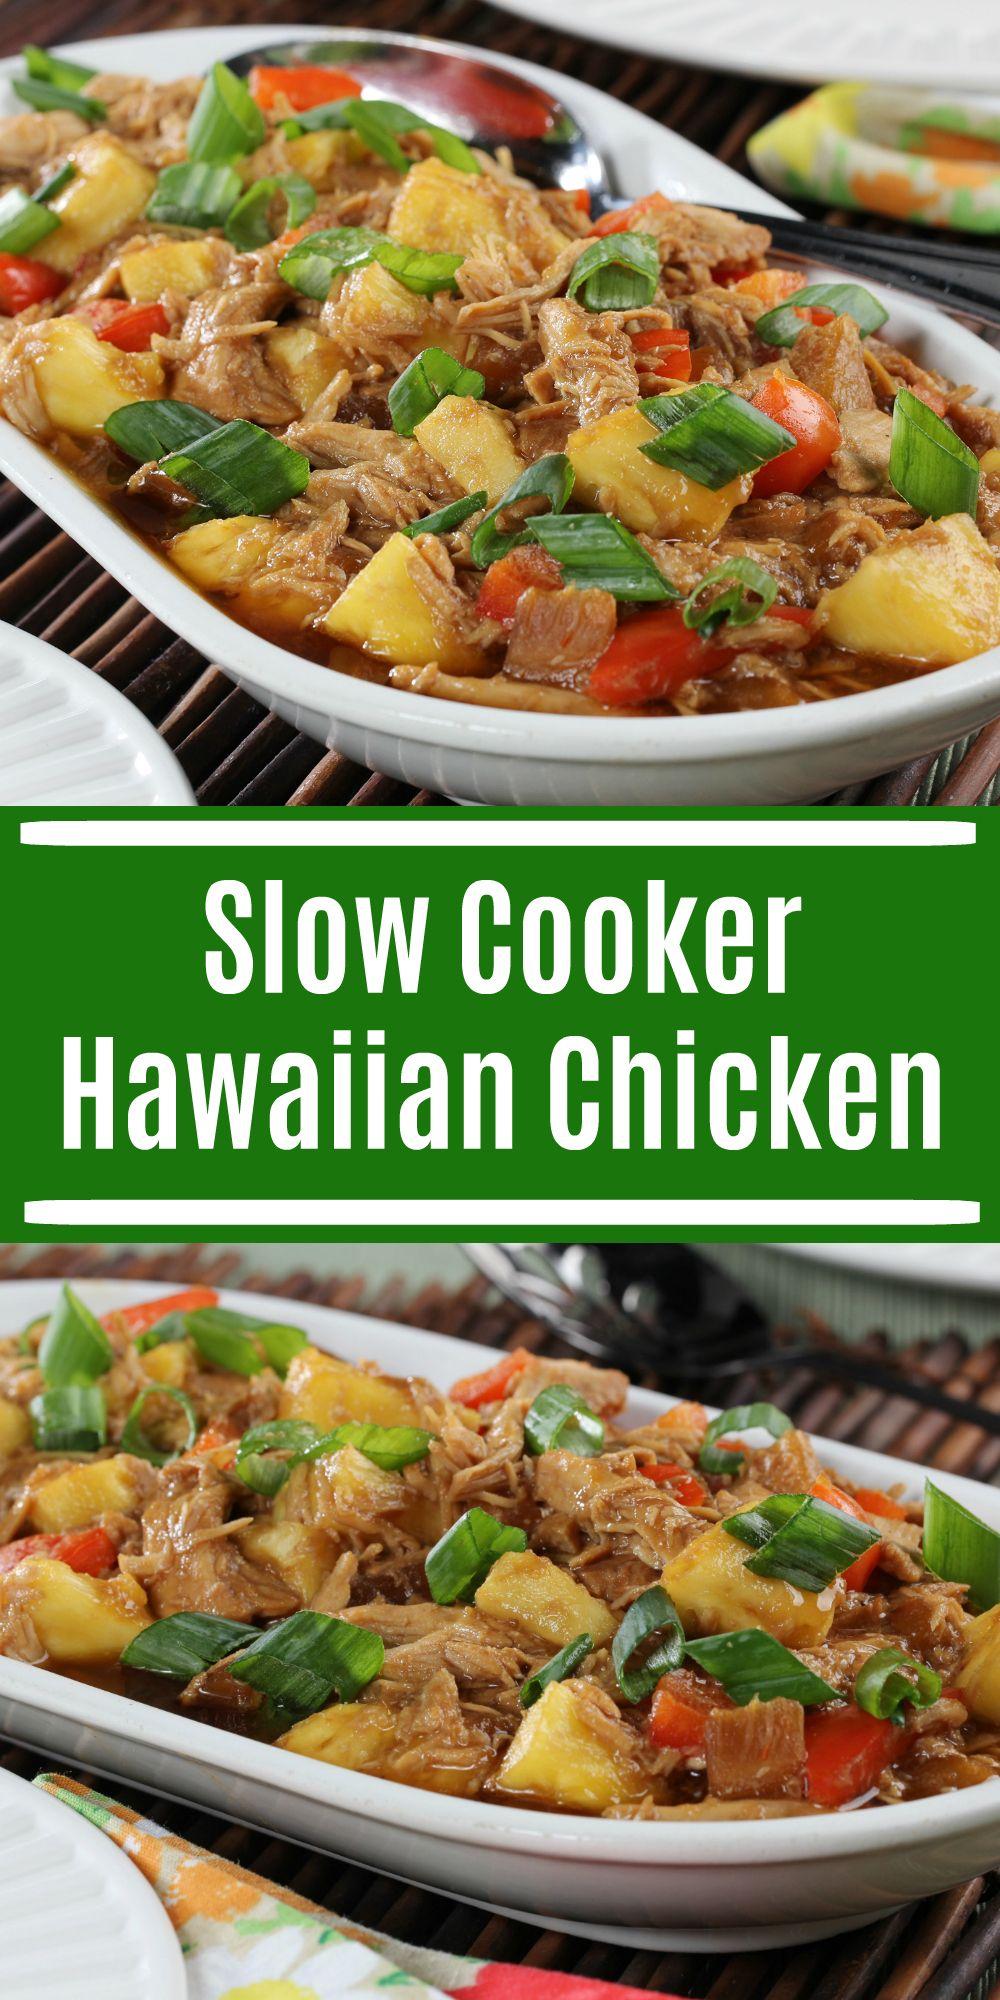 Slow Cooker Hawaiian Chicken Recipe Everyday Diabetic Recipes